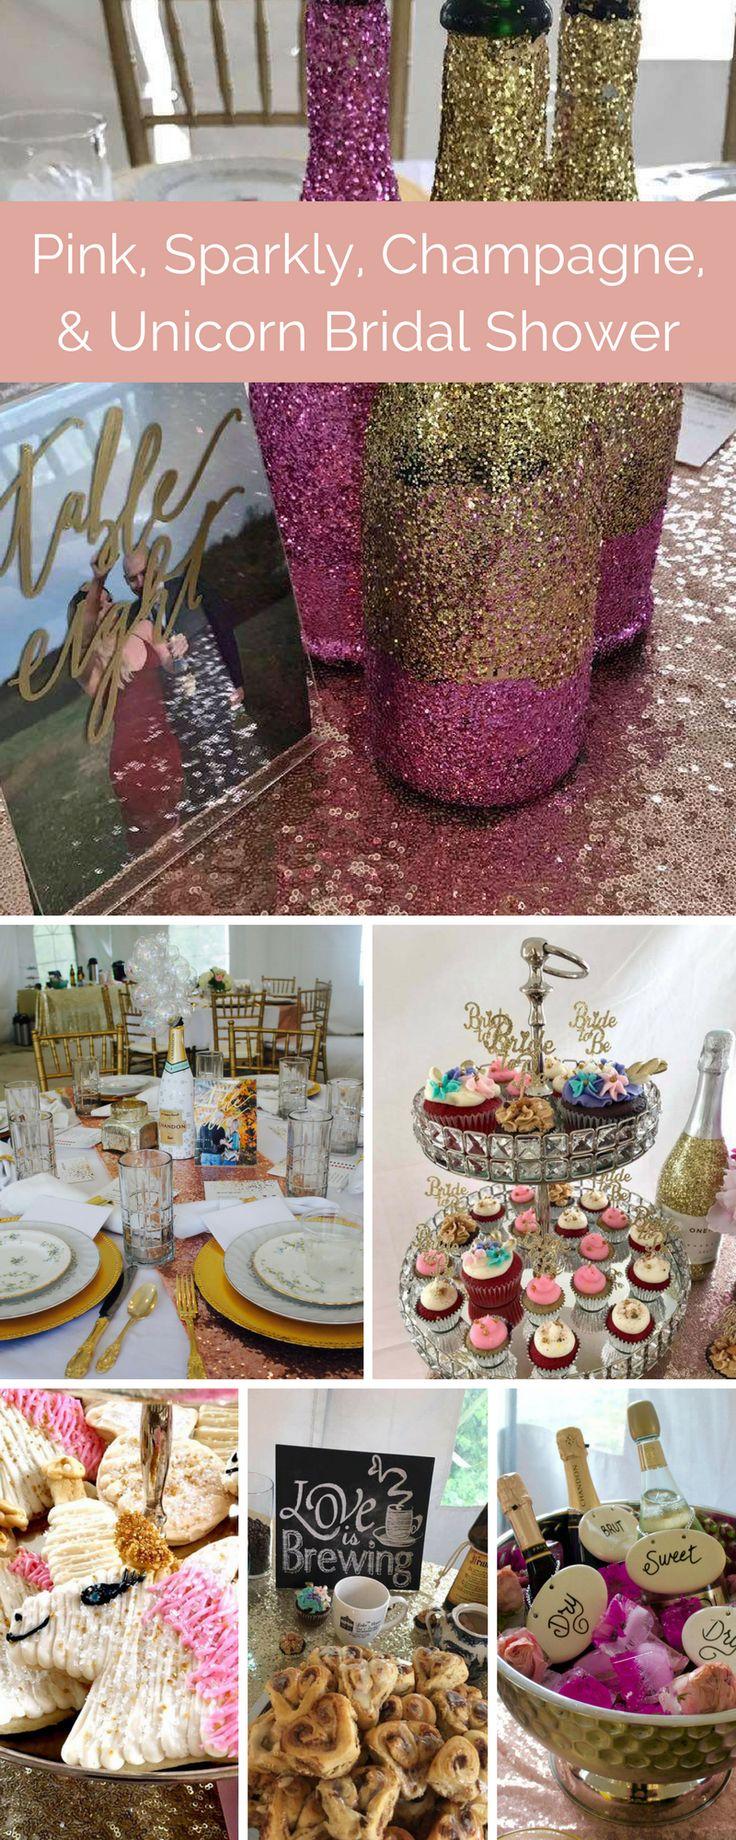 Pink, Sparkly, Champagne, Unicorn Bridal Shower.